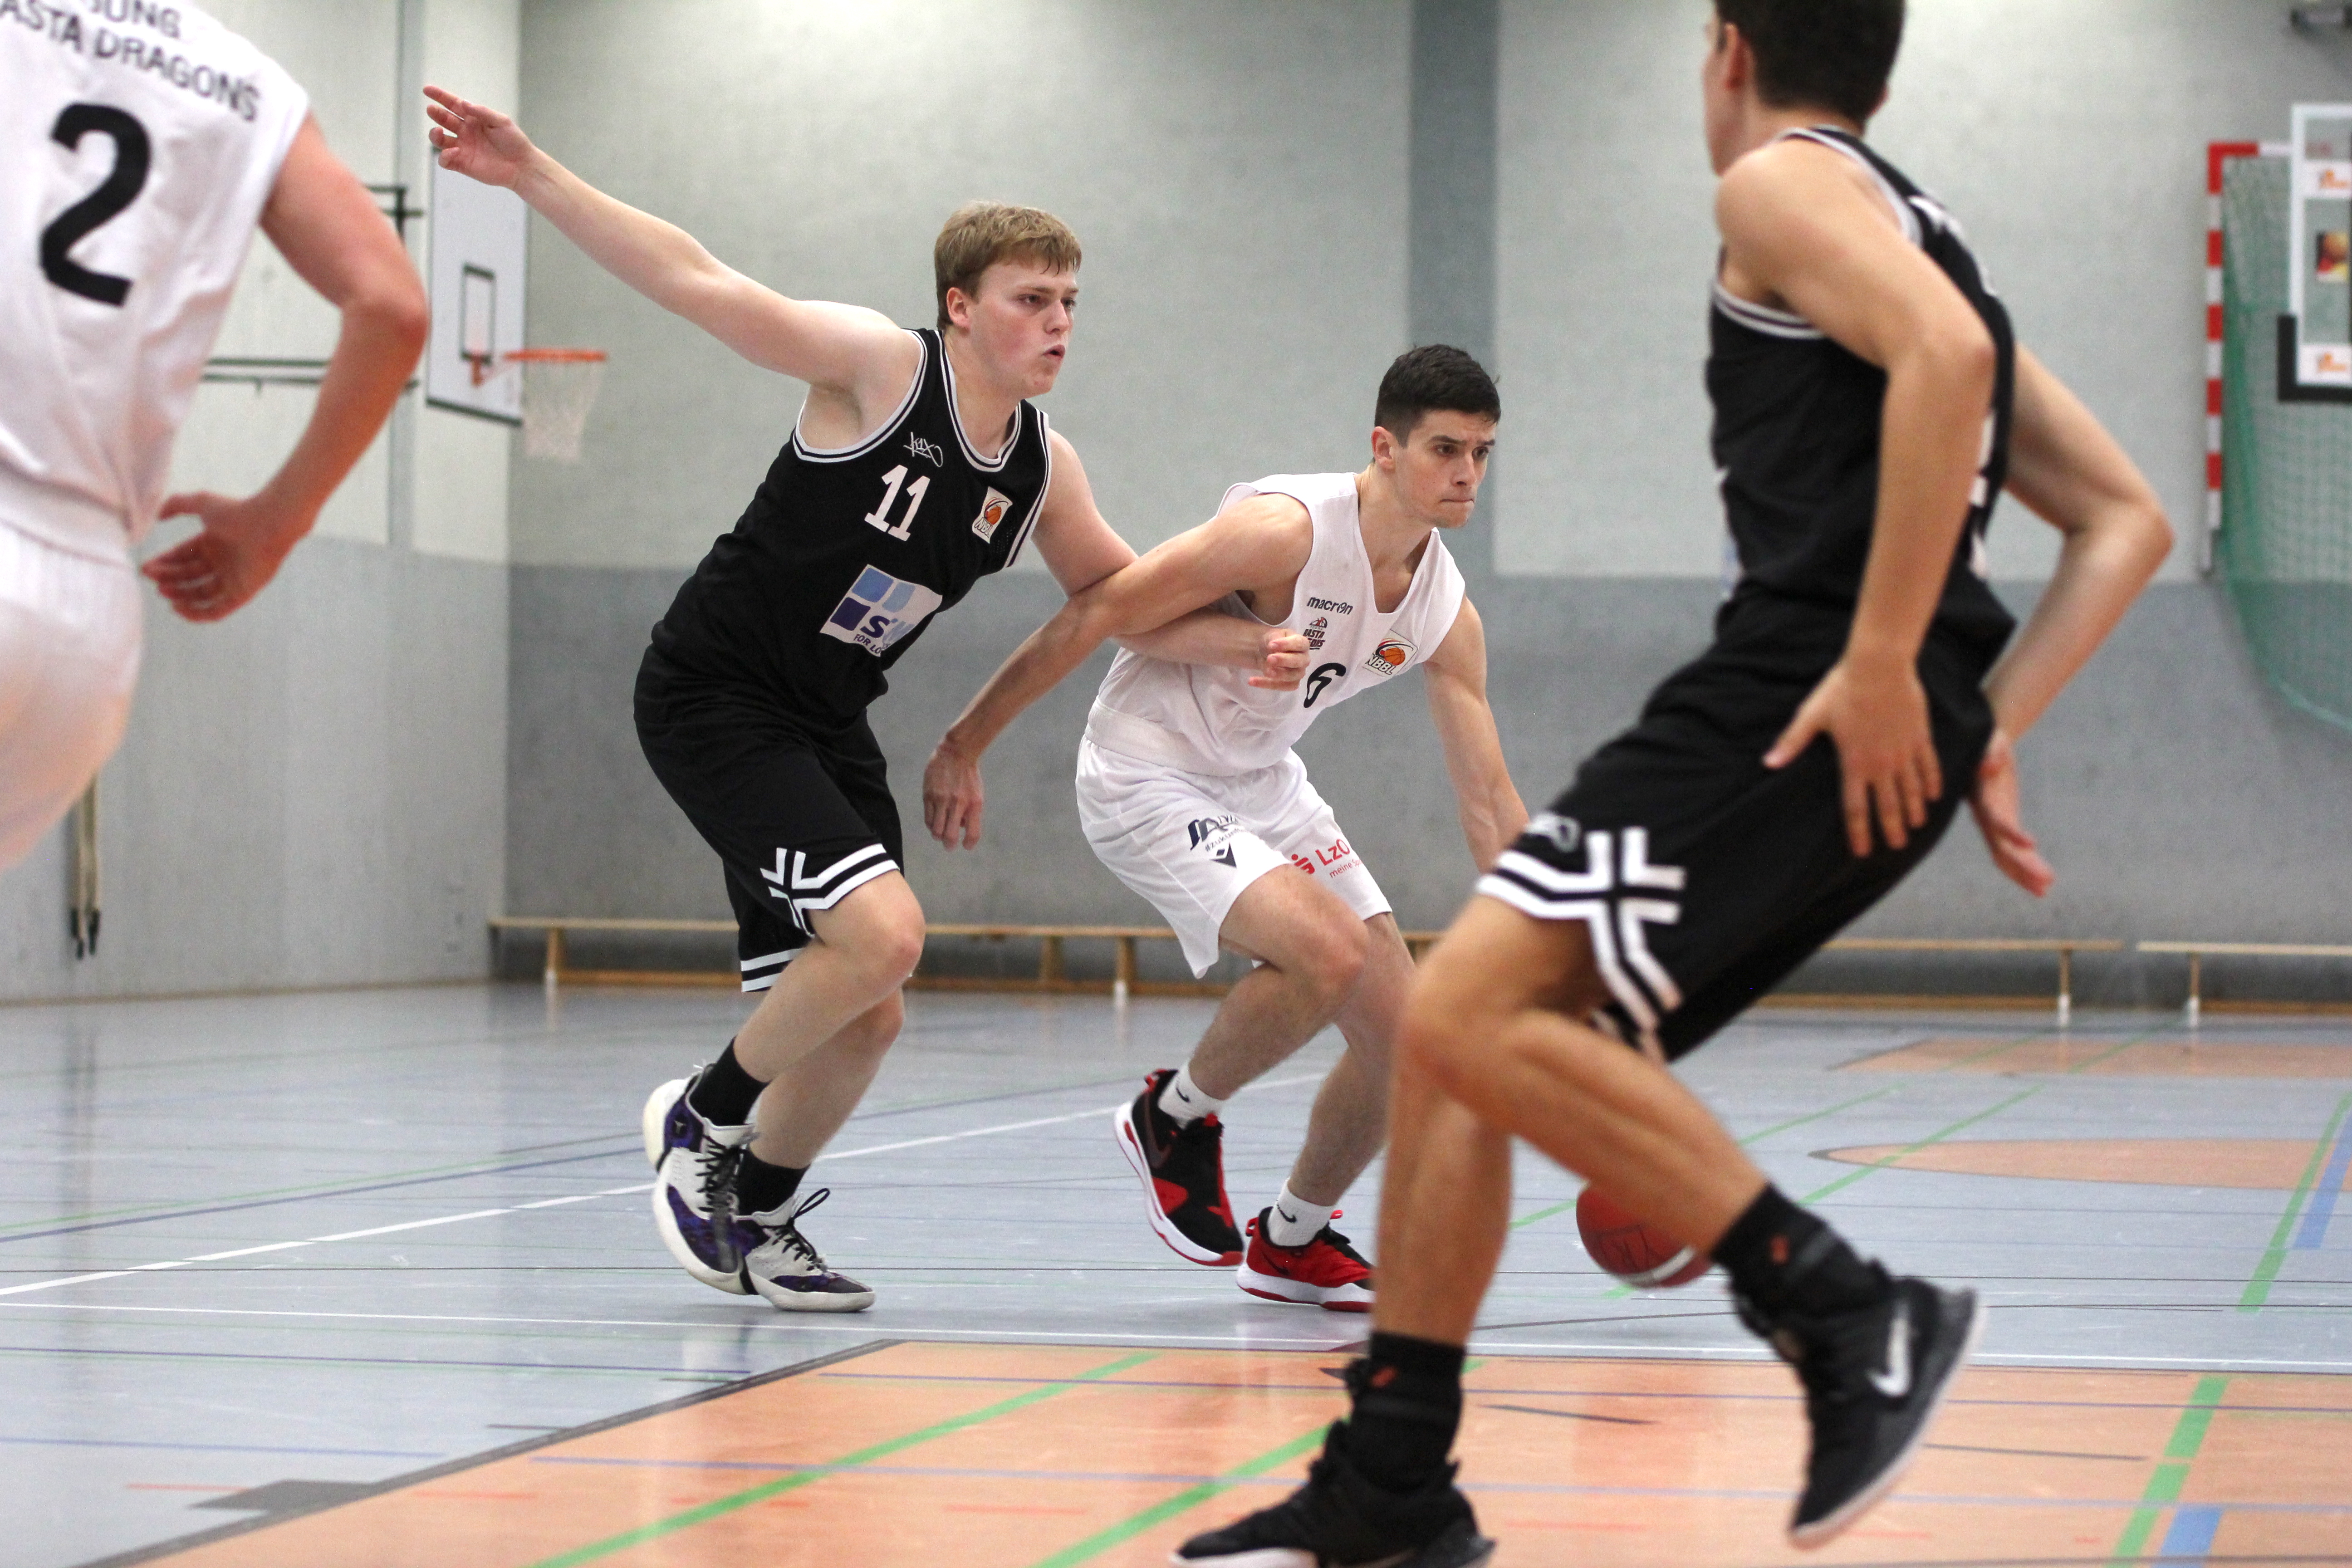 NBBL_20-21_YOUNG-RASTA-DRAGONS_Münster_Spieltag1_Emilijus-Peleda_7